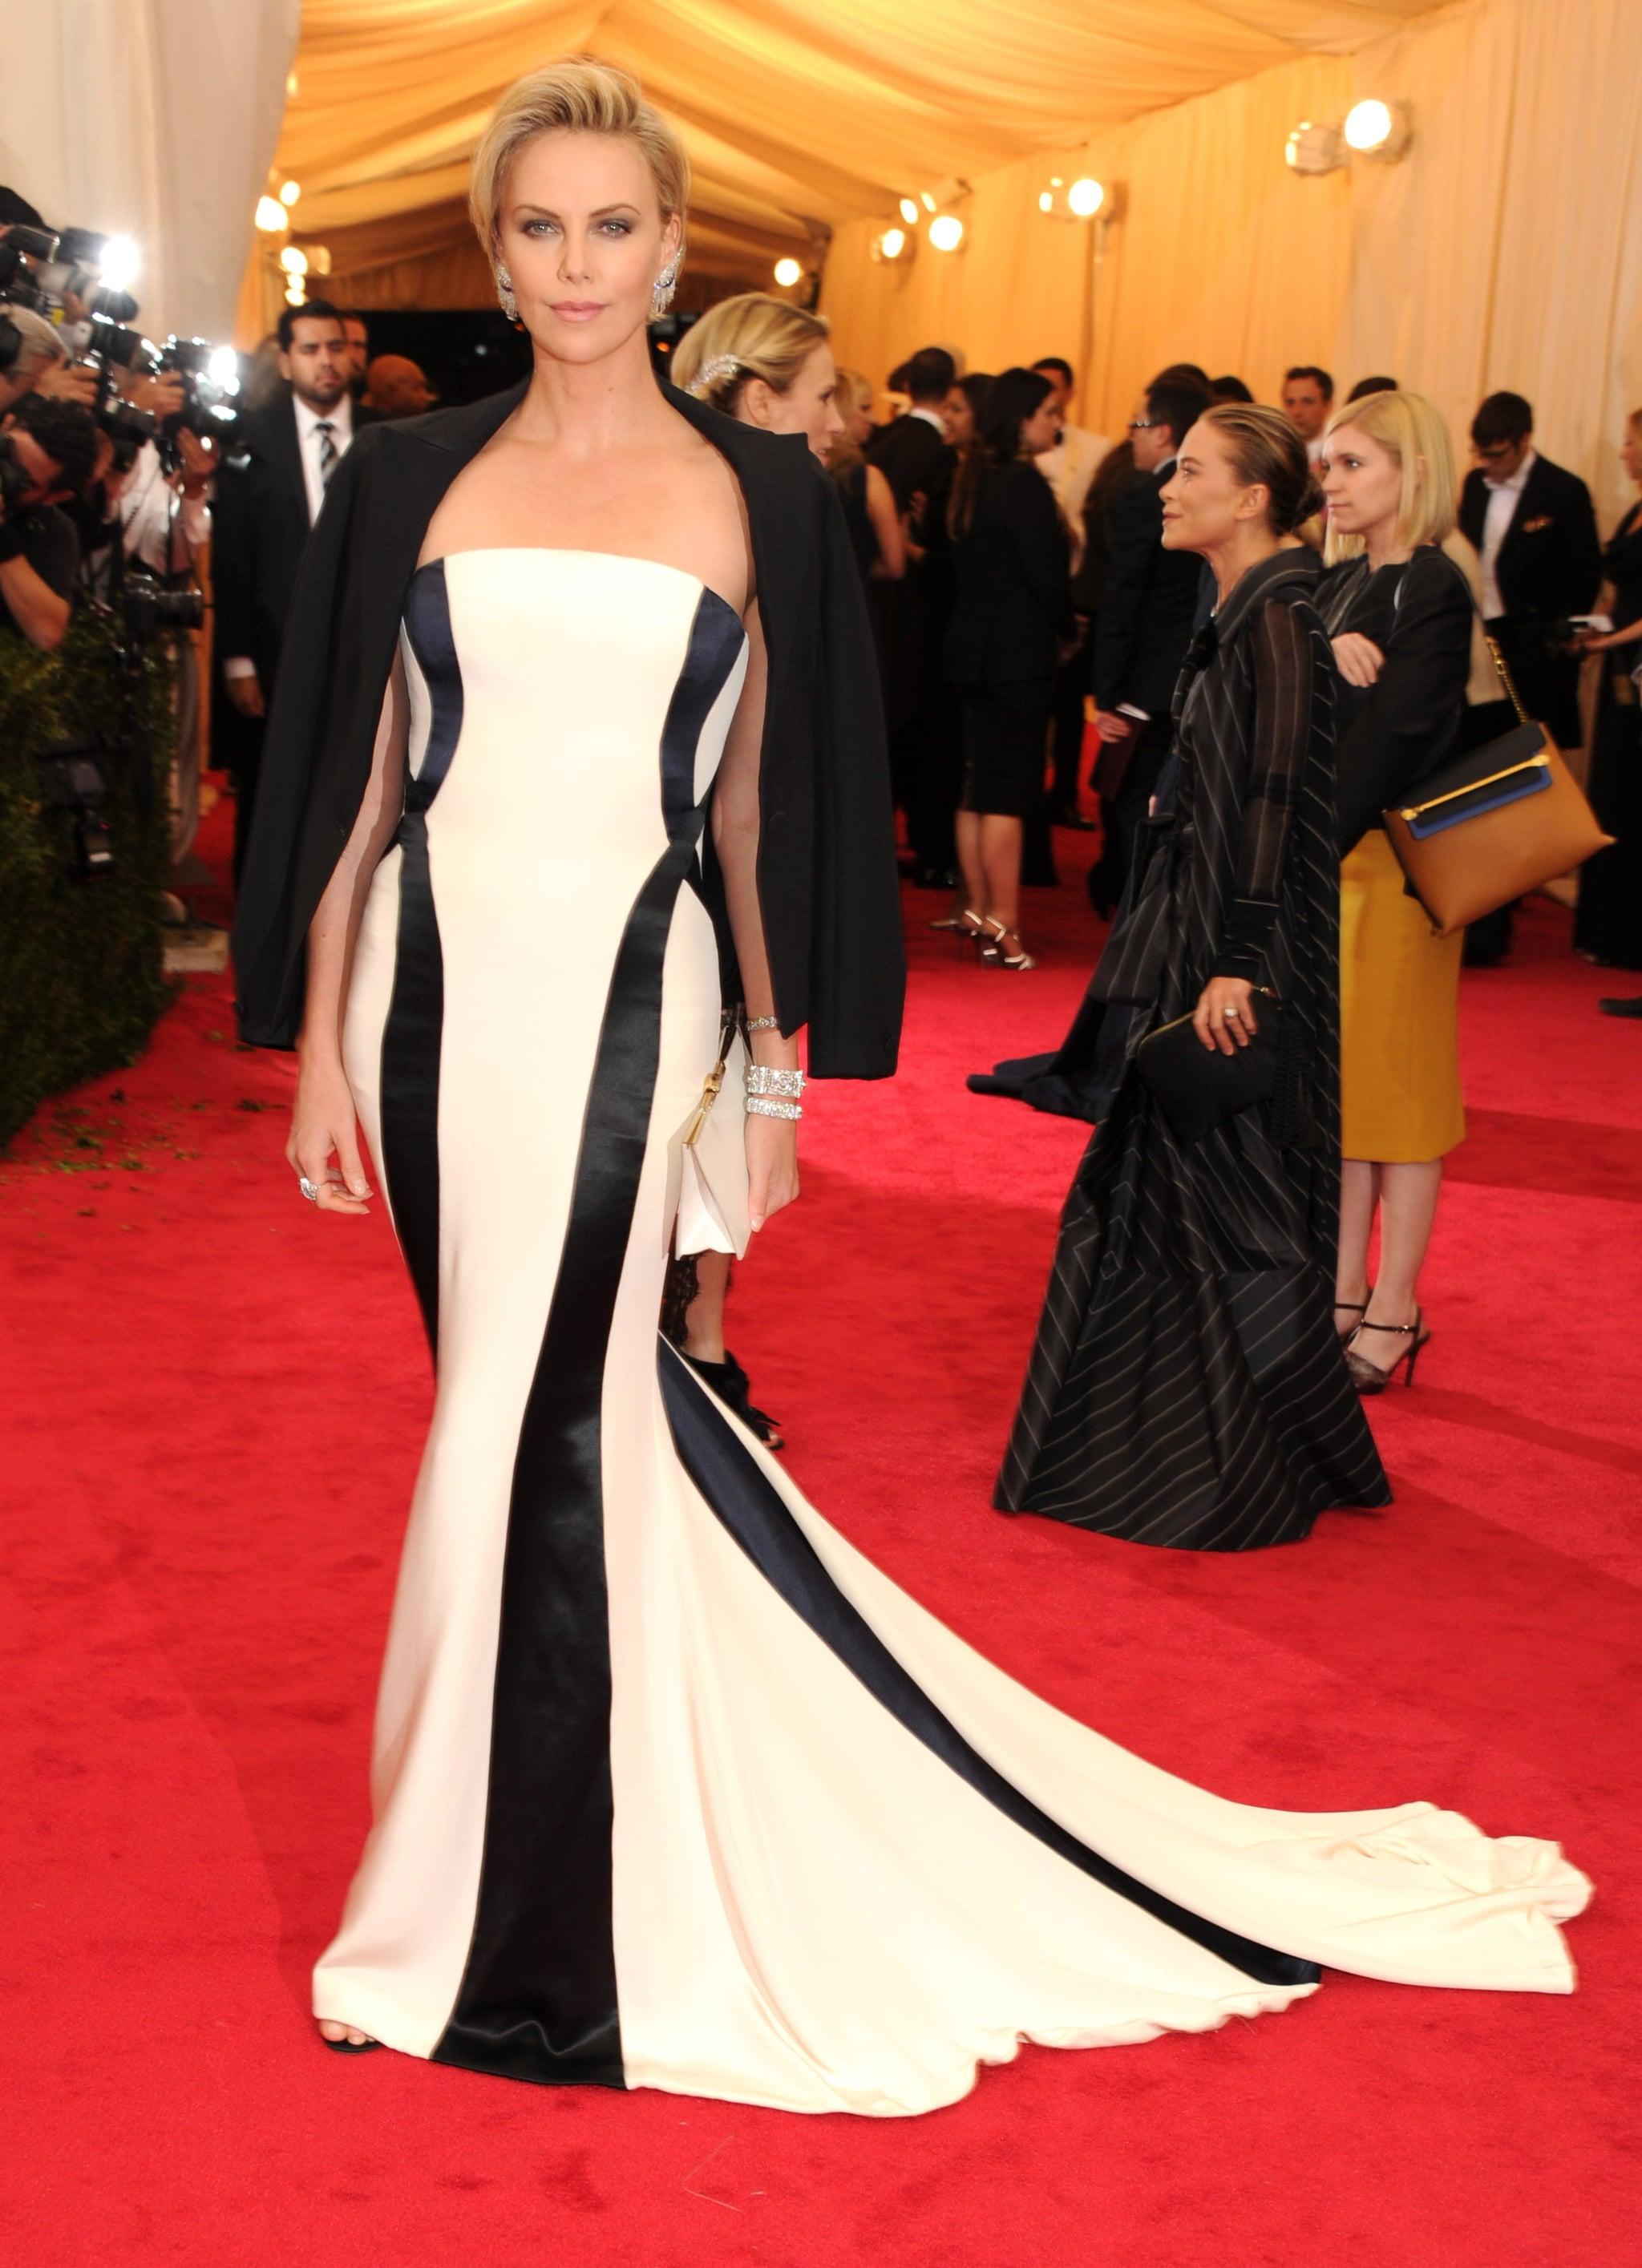 Charlize Theron Brings Sean Penn to the Met Gala